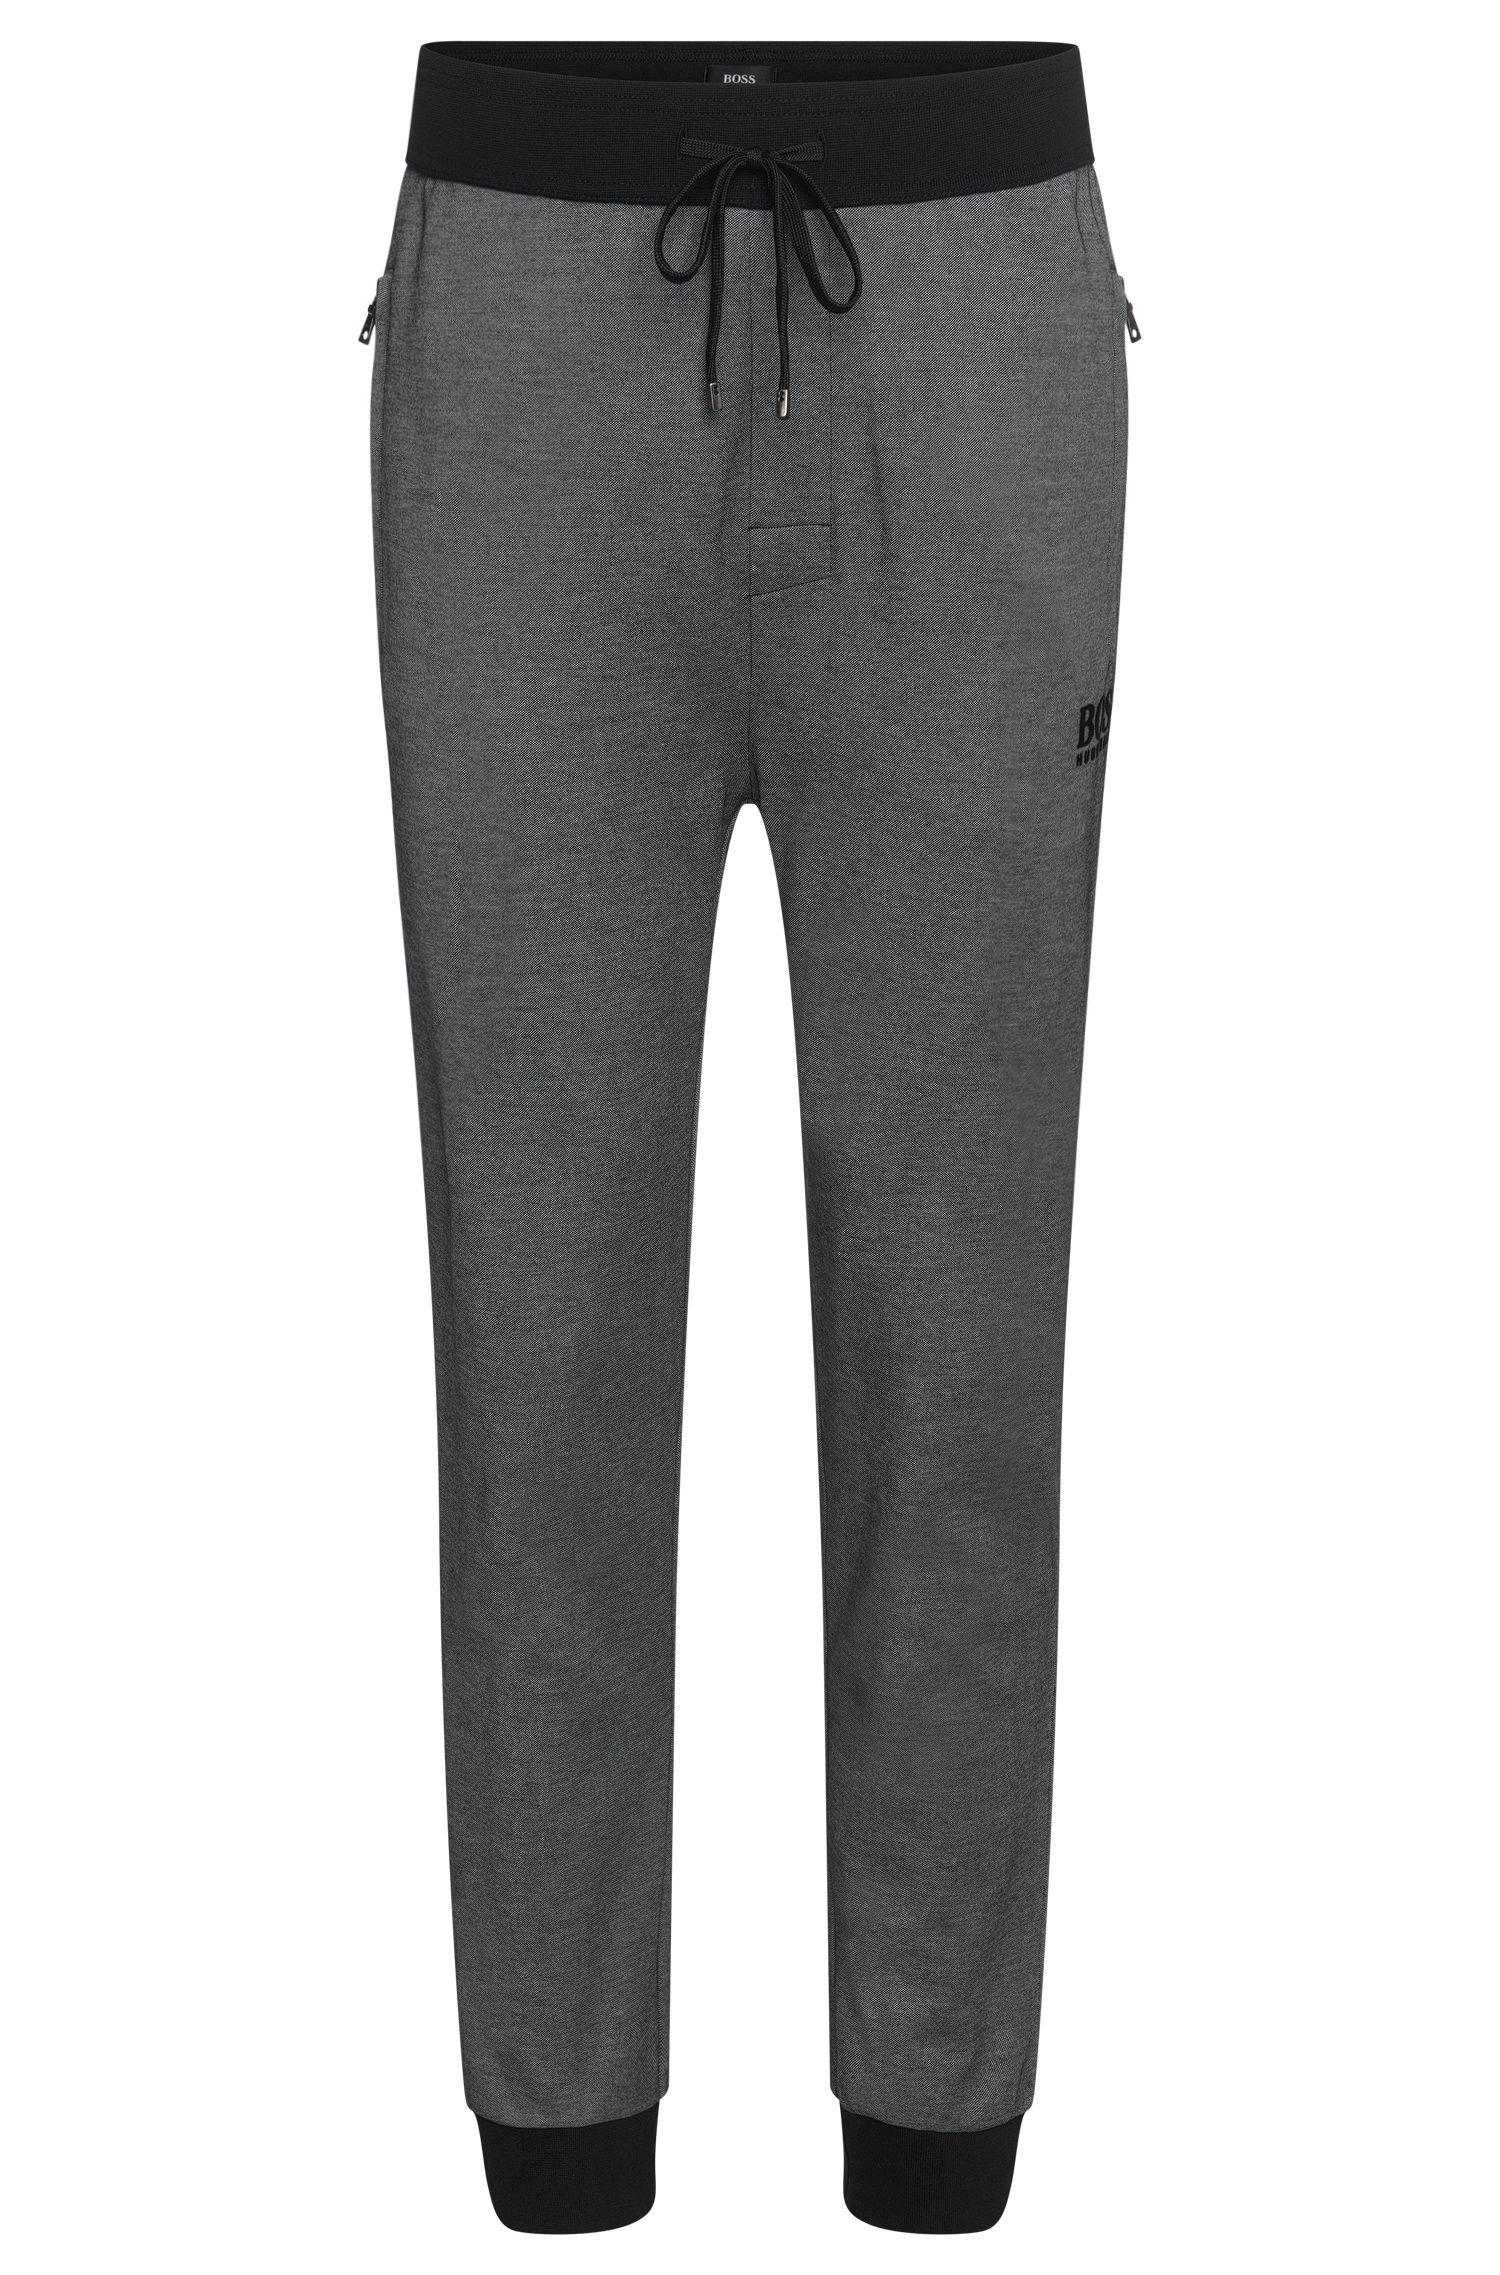 Cotton Blend Lounge Pant | Long Pant Cuffs